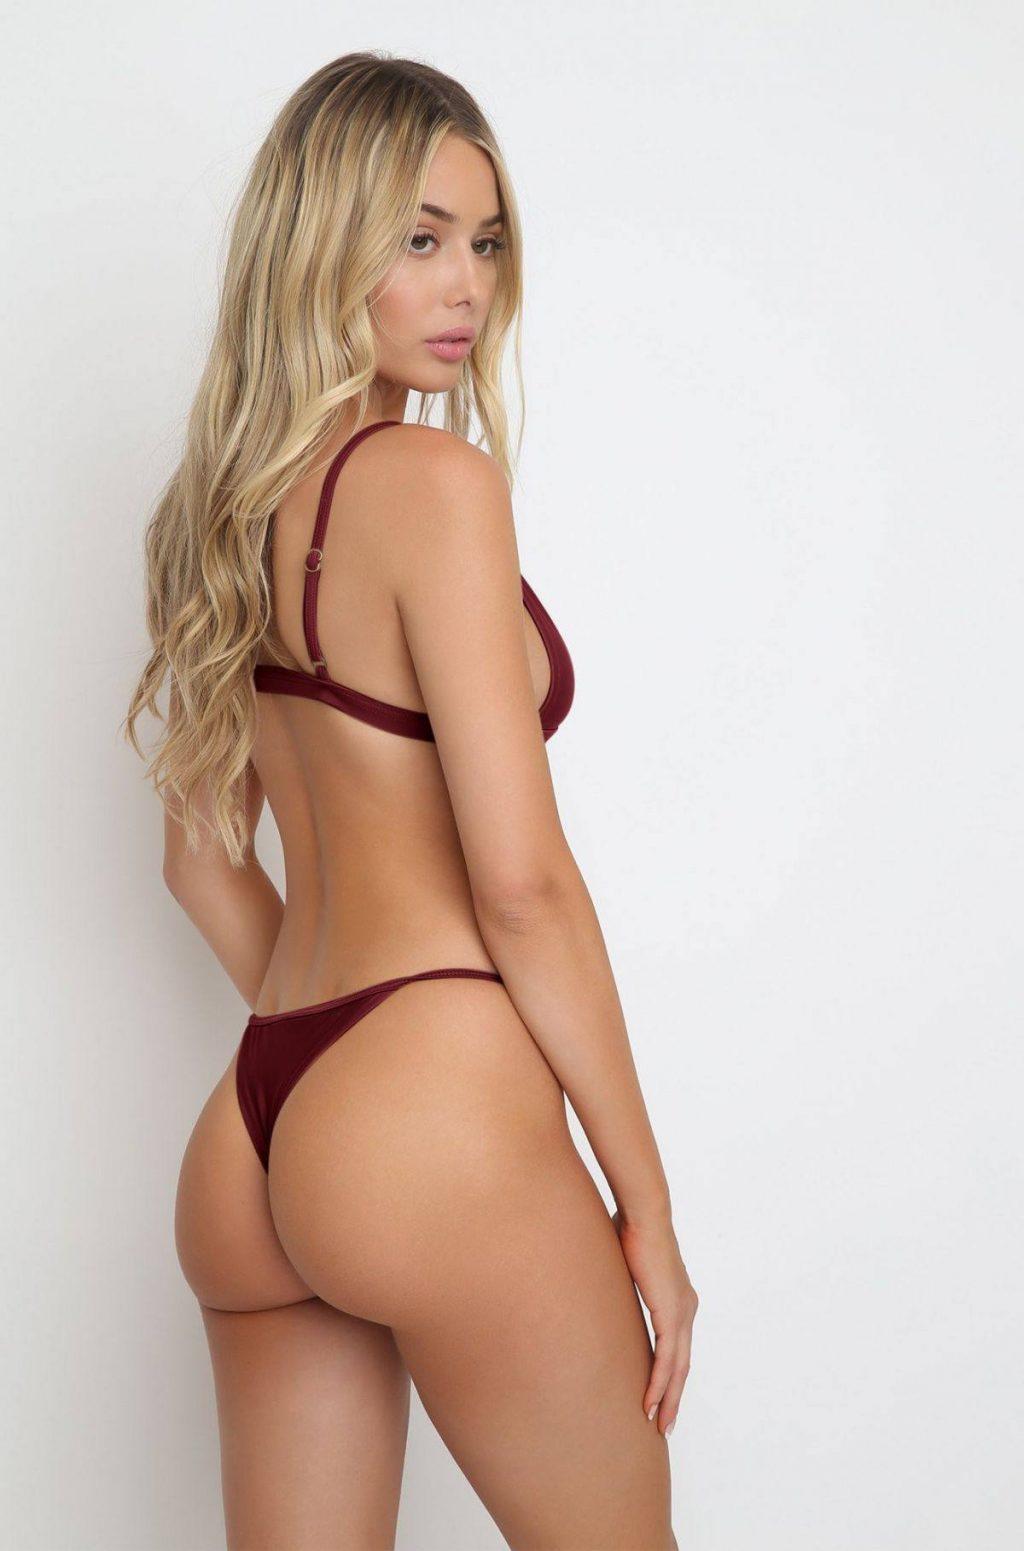 Celeste Bright Poses in Bikinis for Ishine365 Swimwear Collection (68 Photos)